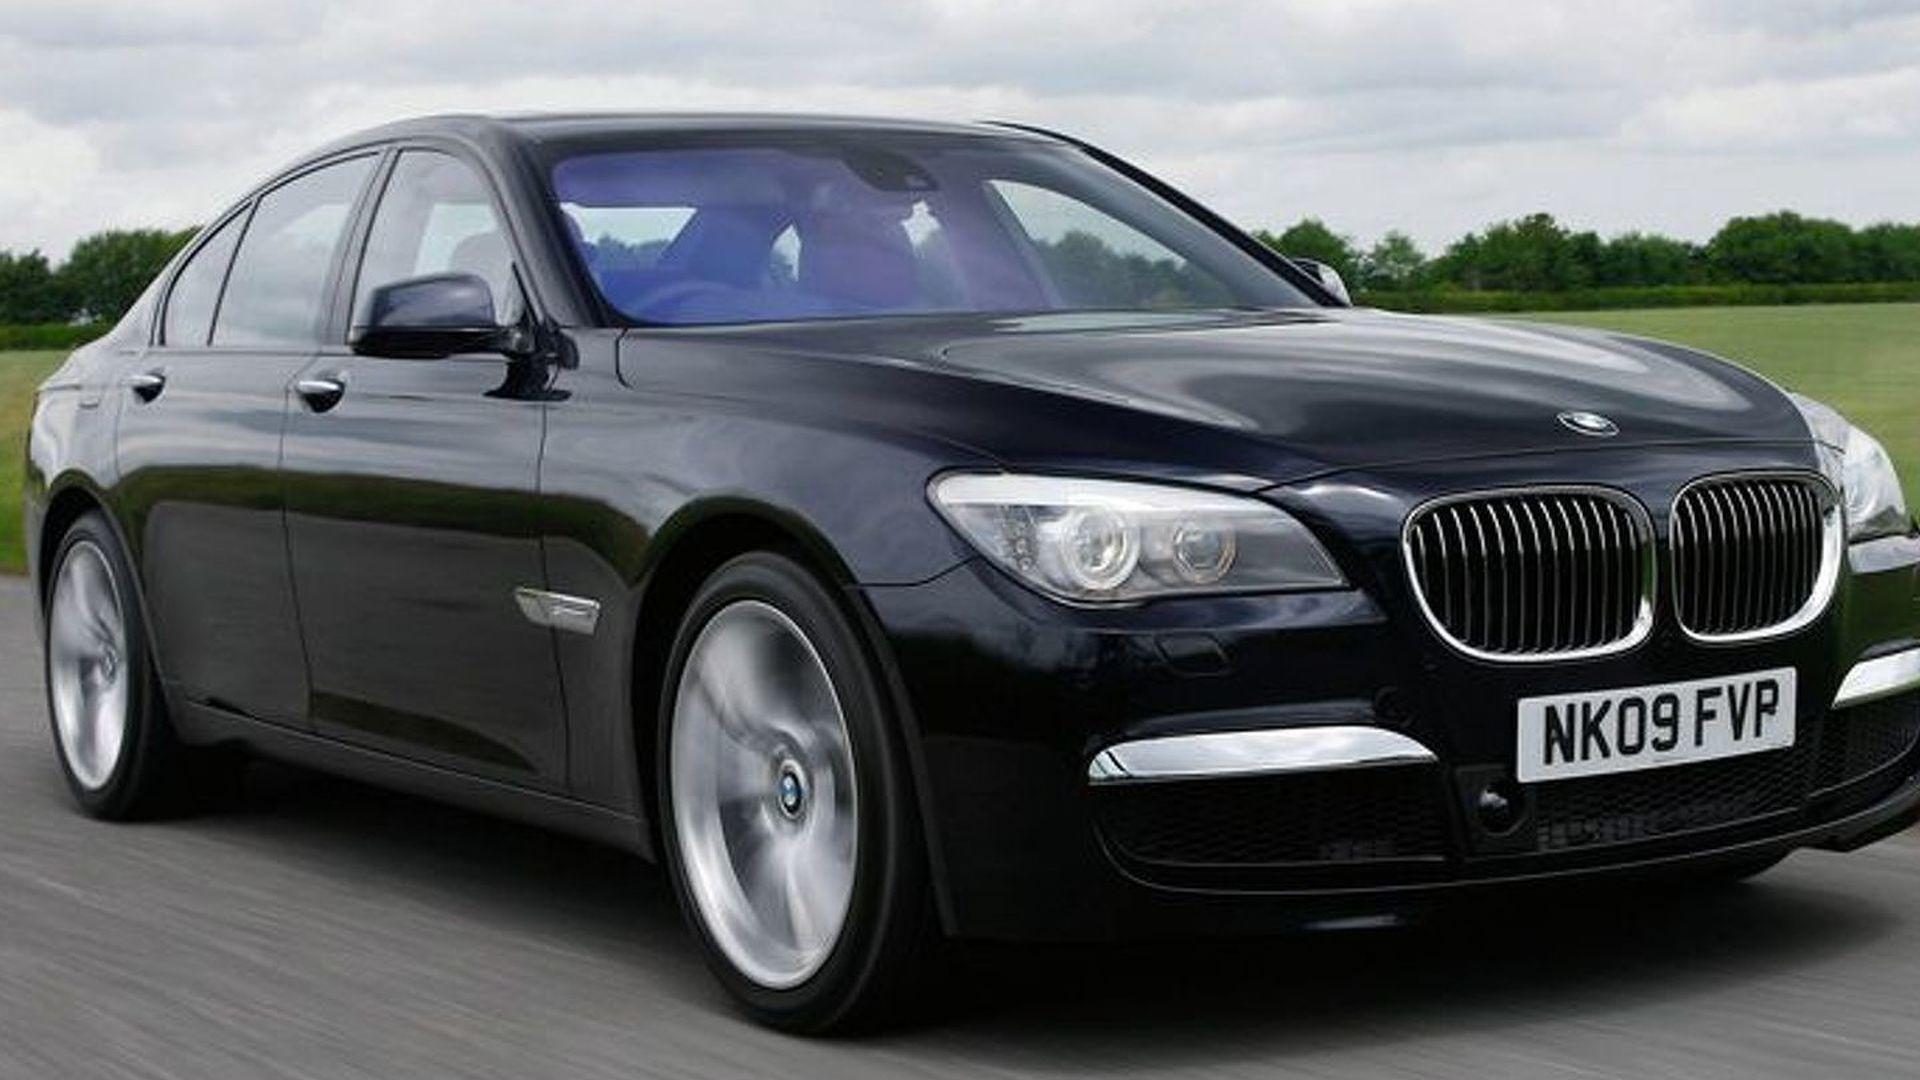 New BMW M division boss confirms no M7